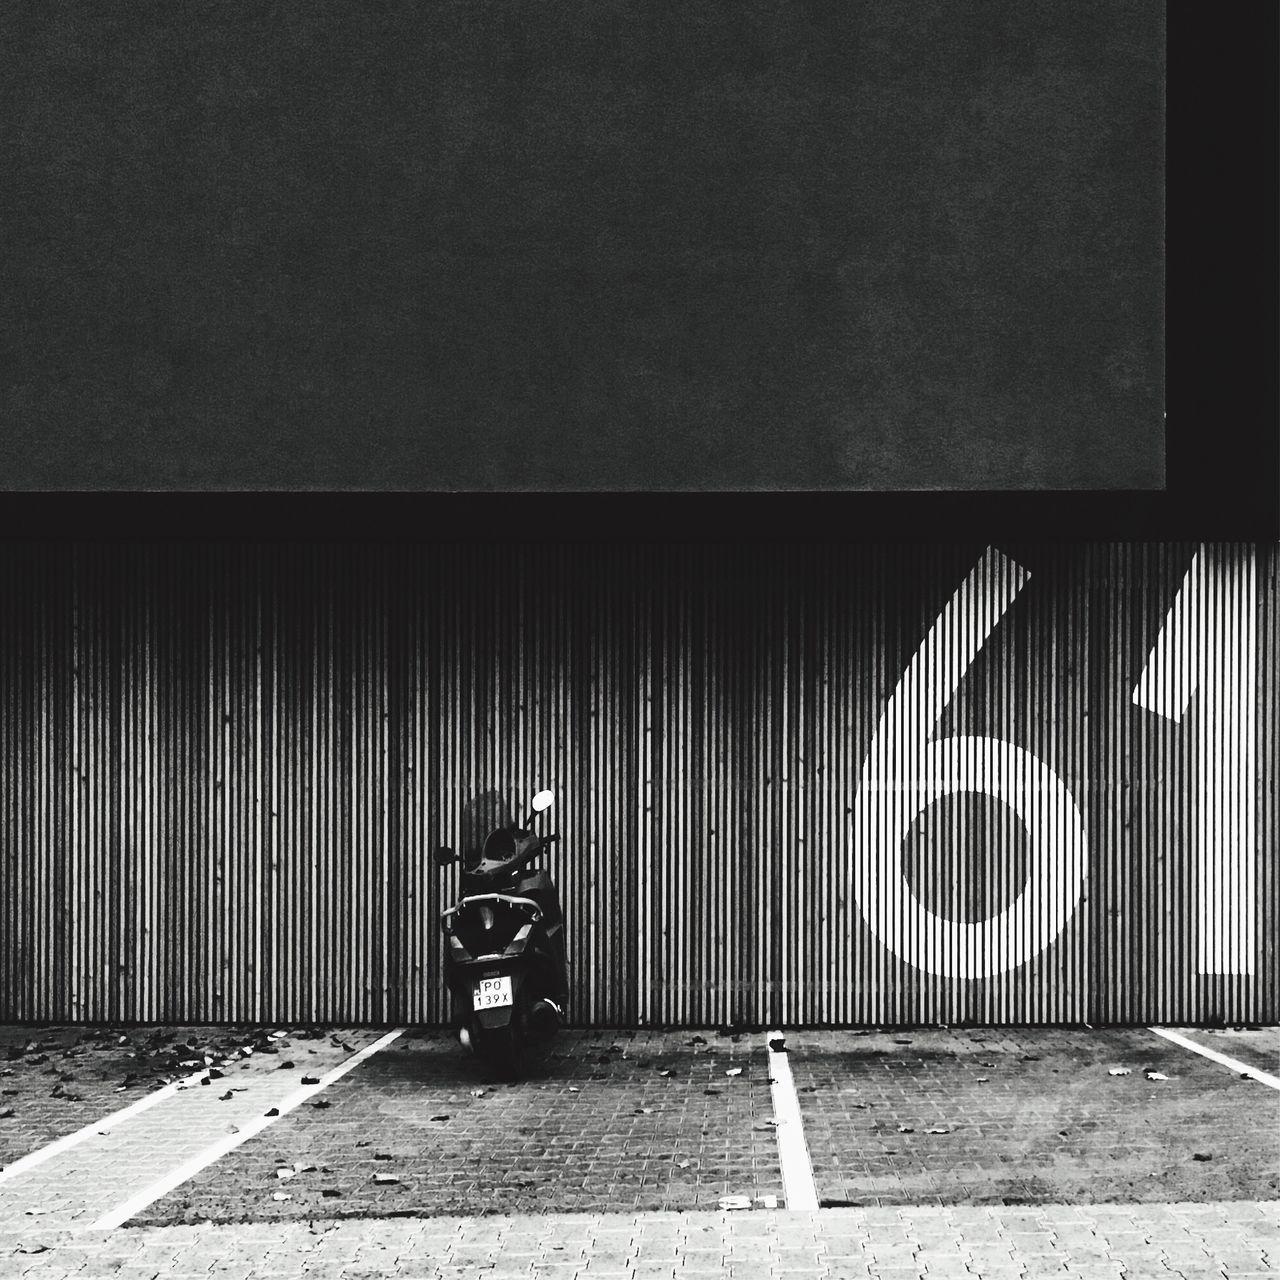 Blackandwhite Minimalism Number Digits Parking Modern Architecture Scooter